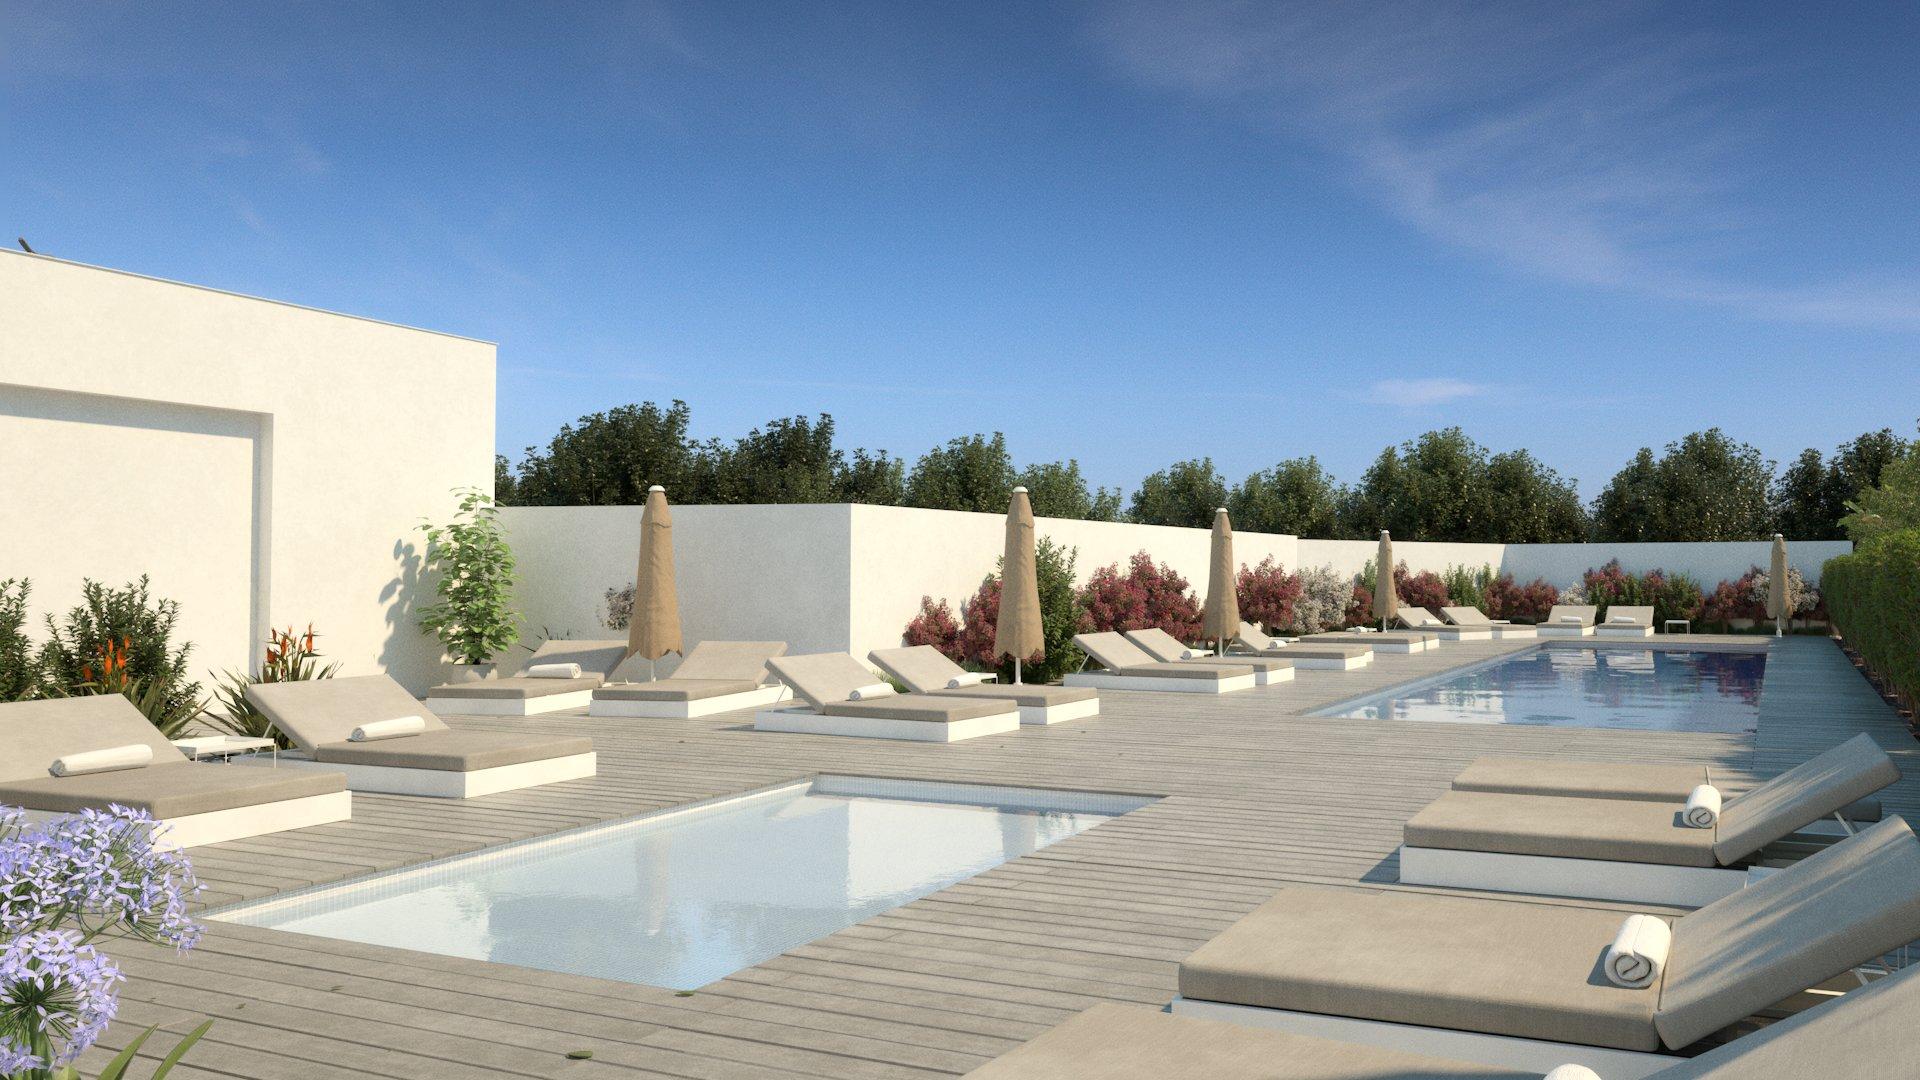 2 Bedroom Apartment Lagos, Western Algarve Ref: GA409B